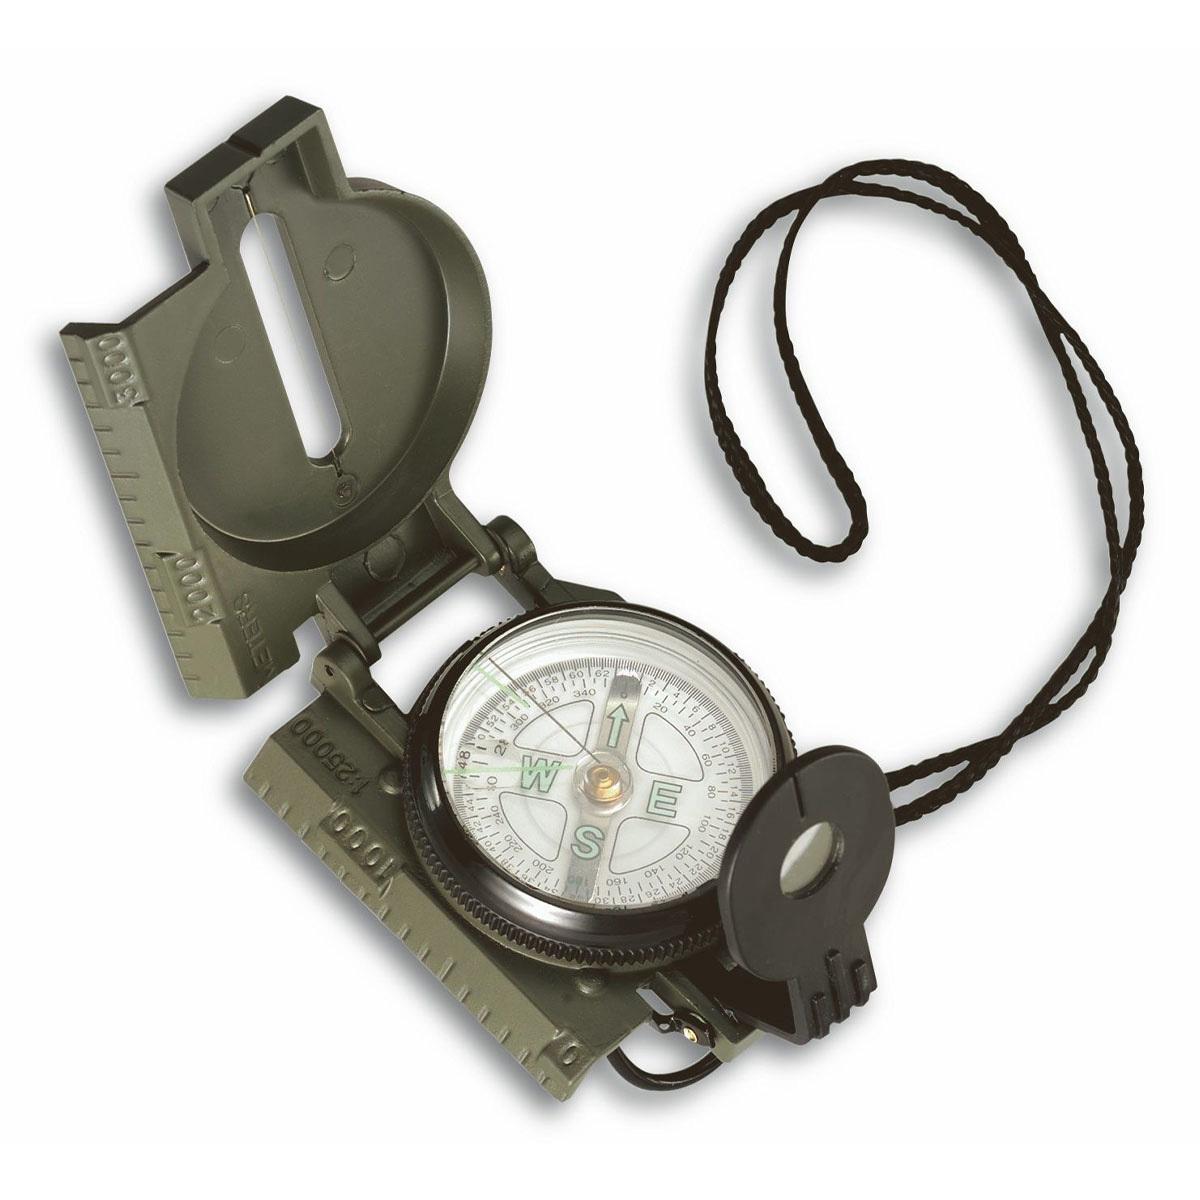 42-1004-marschkompass-1200x1200px.jpg